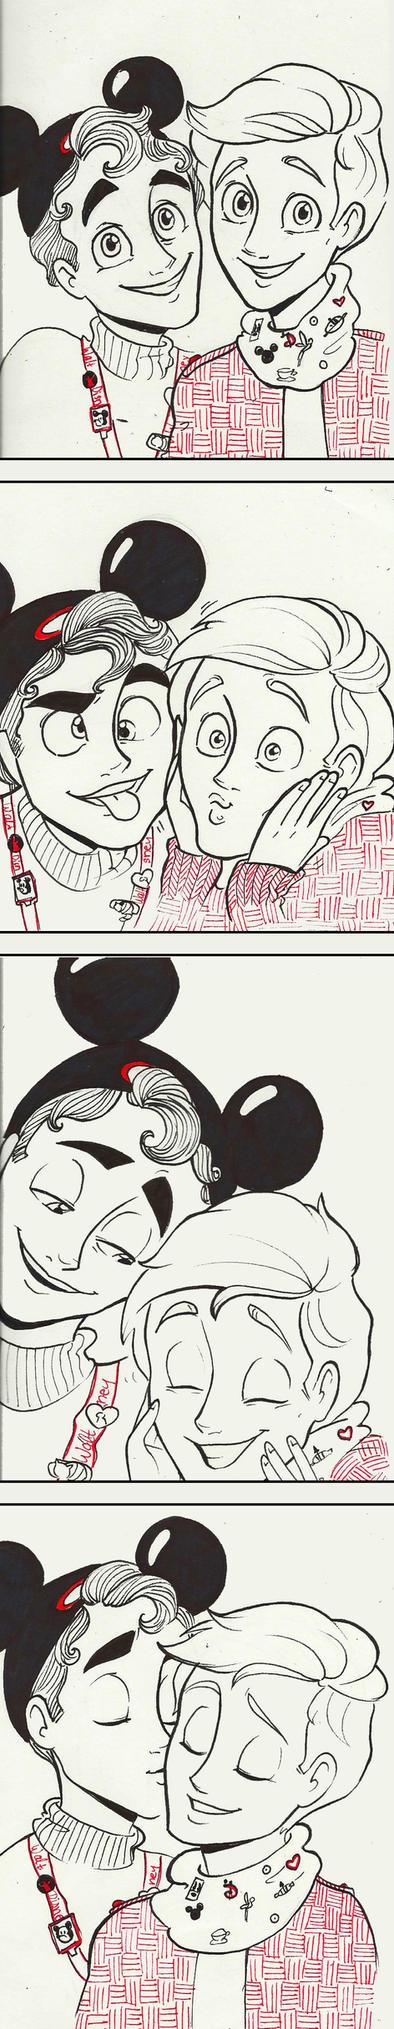 Klaine at Disneyland by Muchacha10